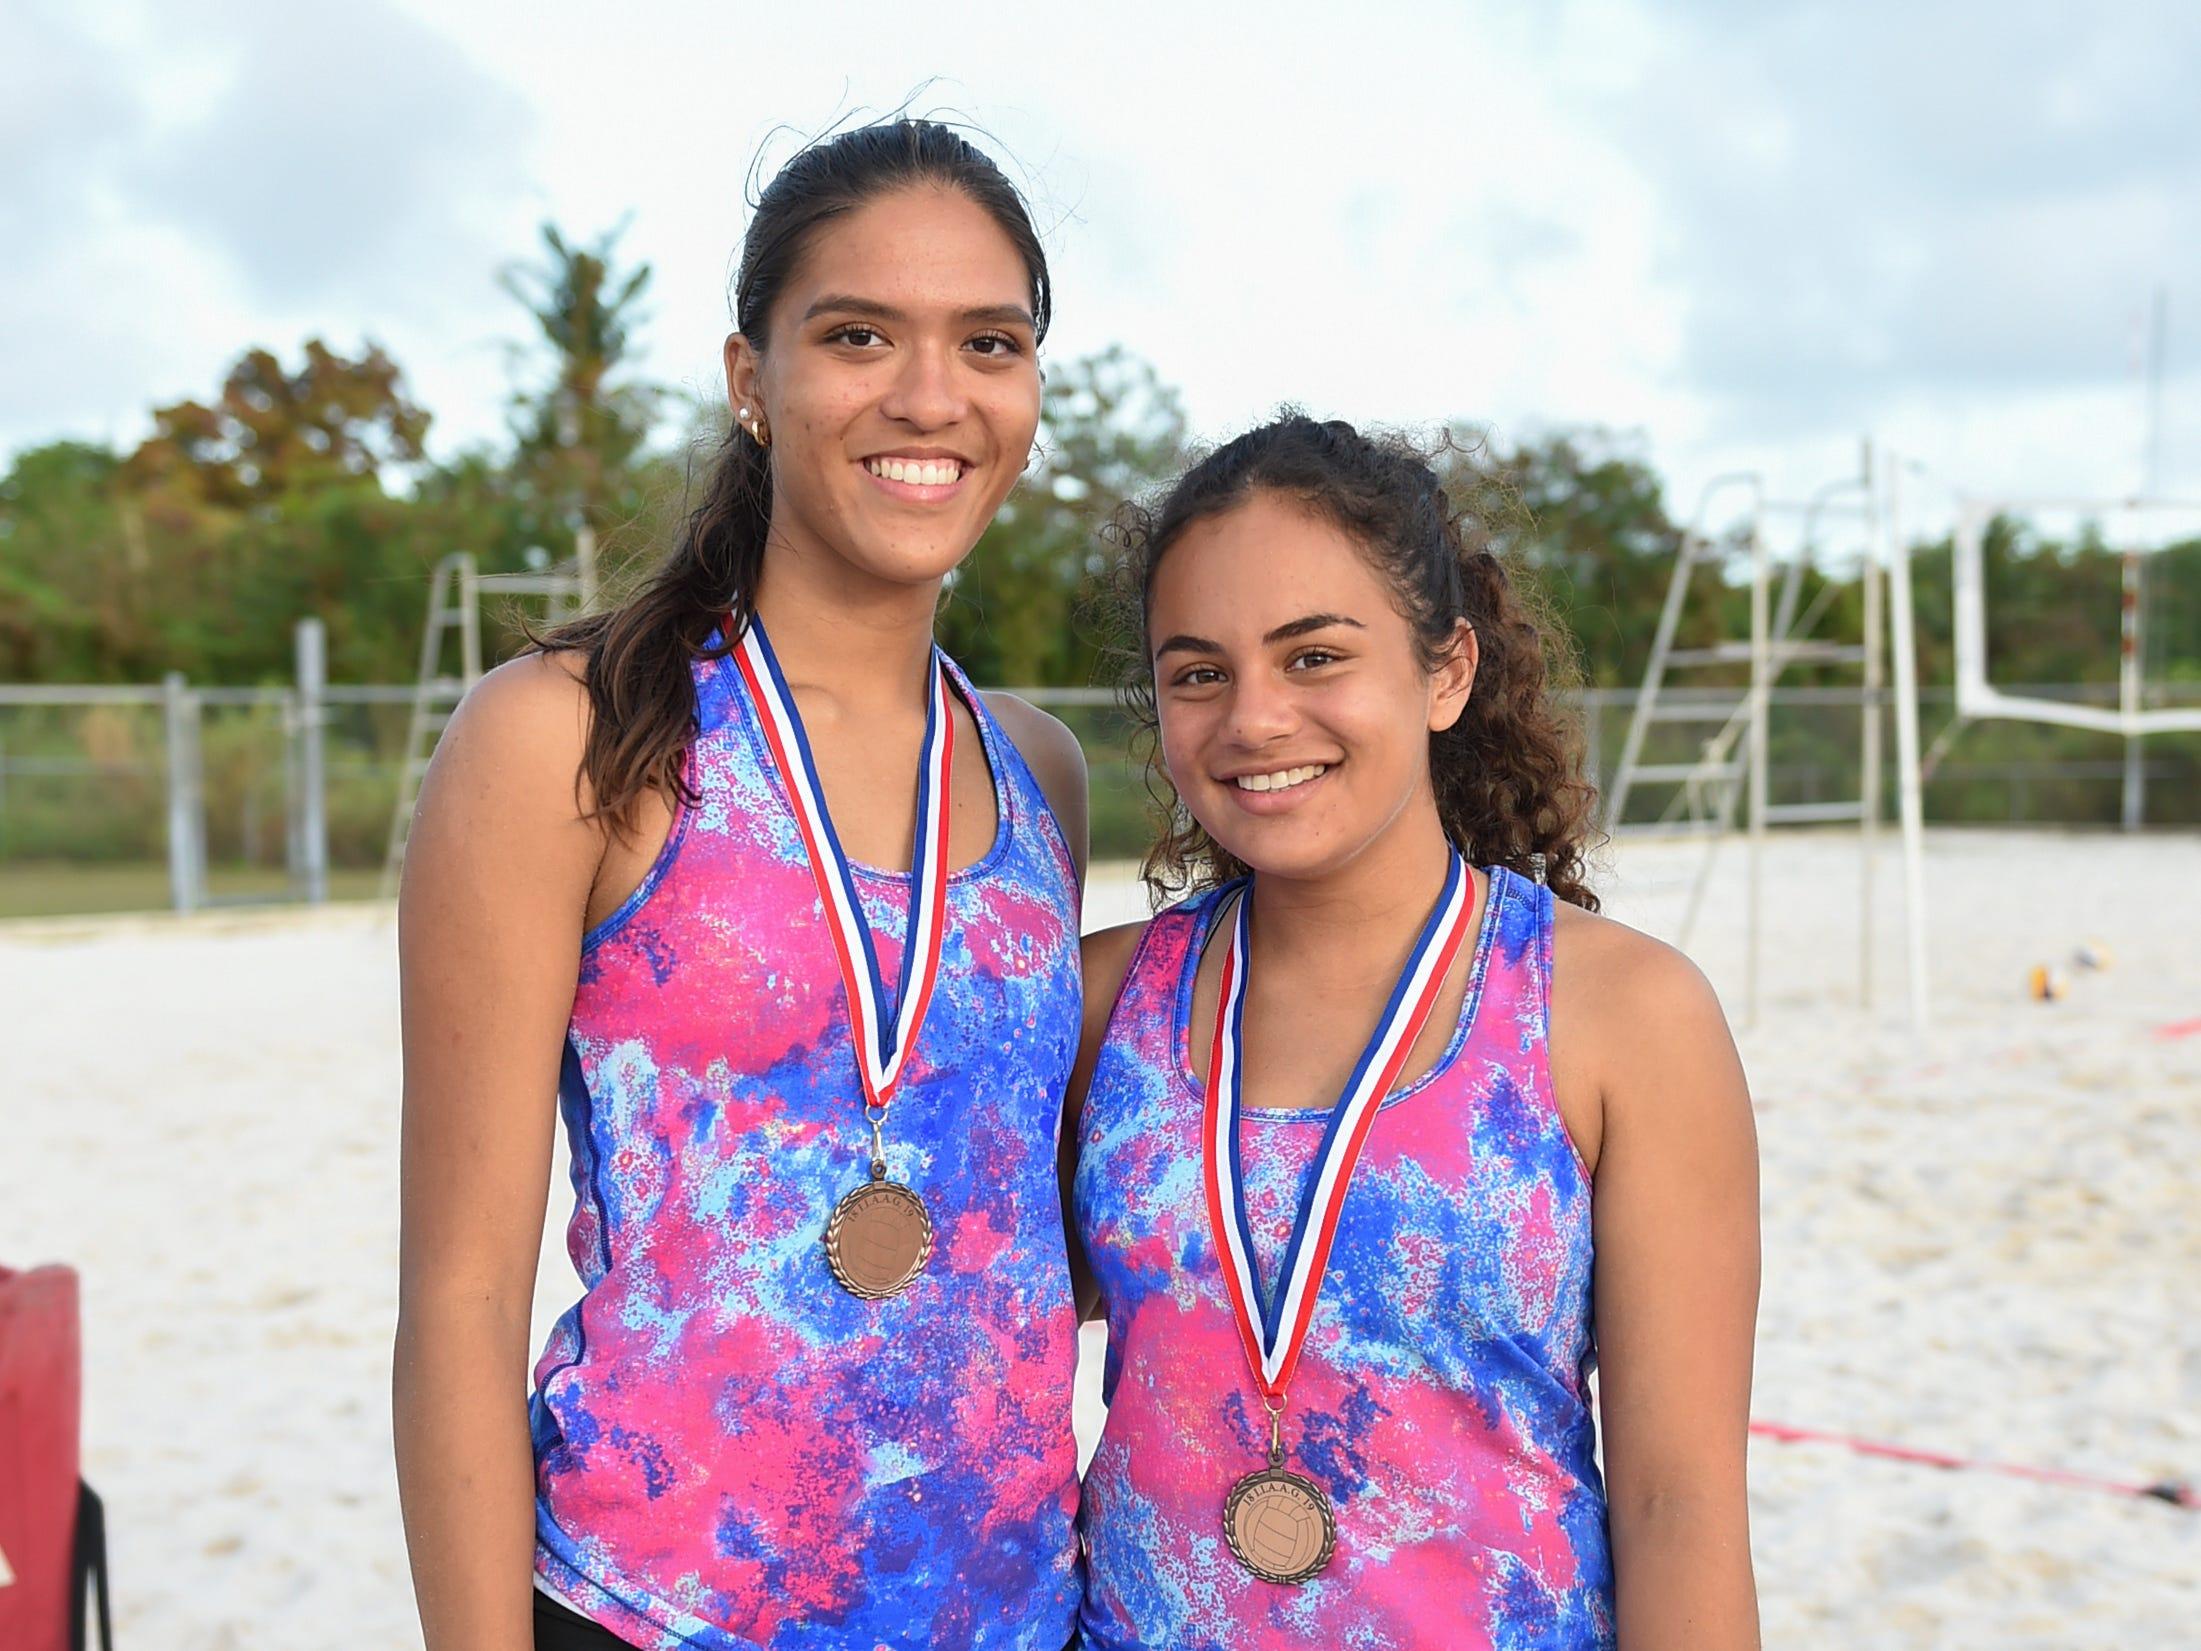 St. John's players Laressa Hallday, left, and Hana Fernandez following their IIAAG Beach Volleyball third place finish at the Guam Football Association National Training Center in Dededo, March 12, 2019.